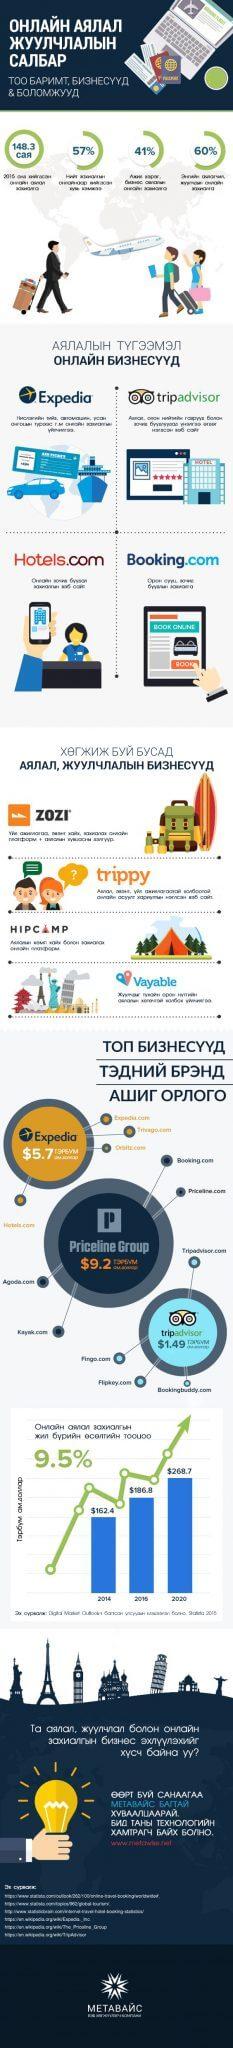 blog-online-travel-industry